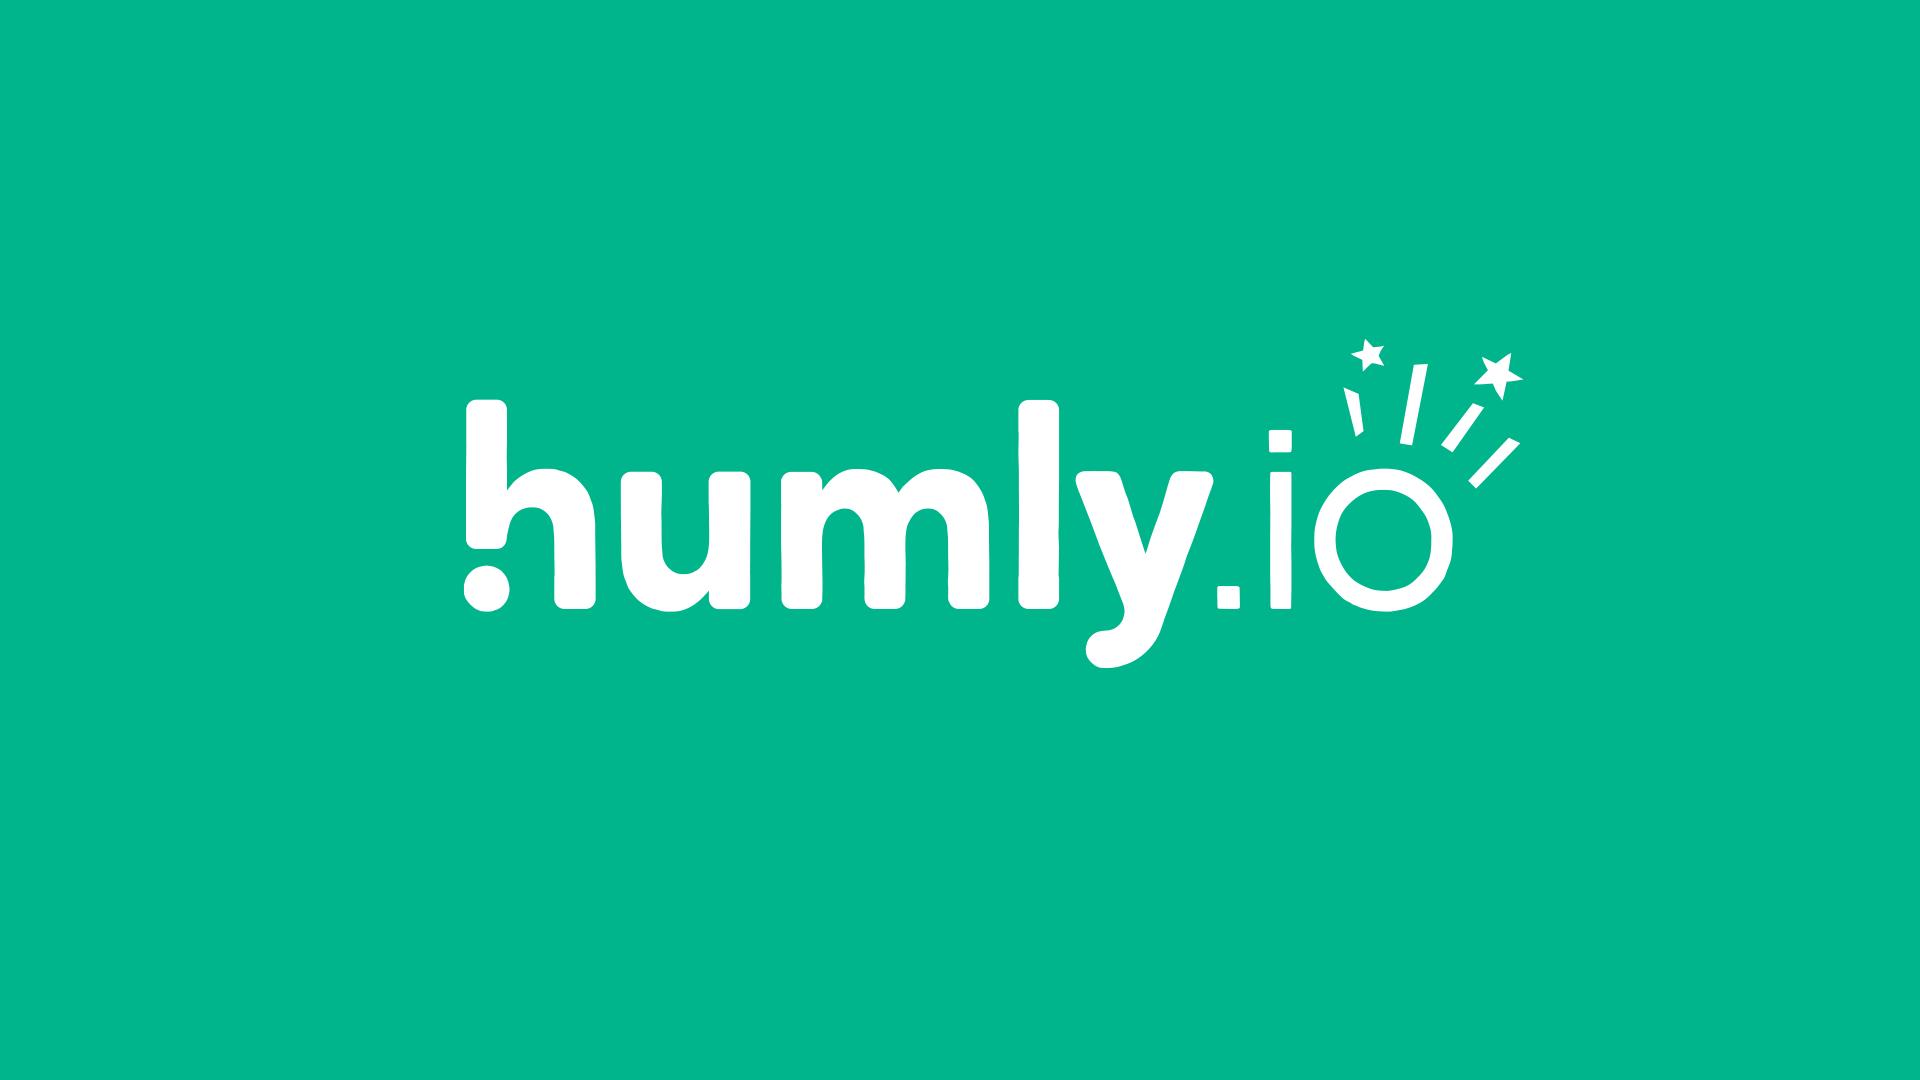 humly_logo_io_neg_1920x1080